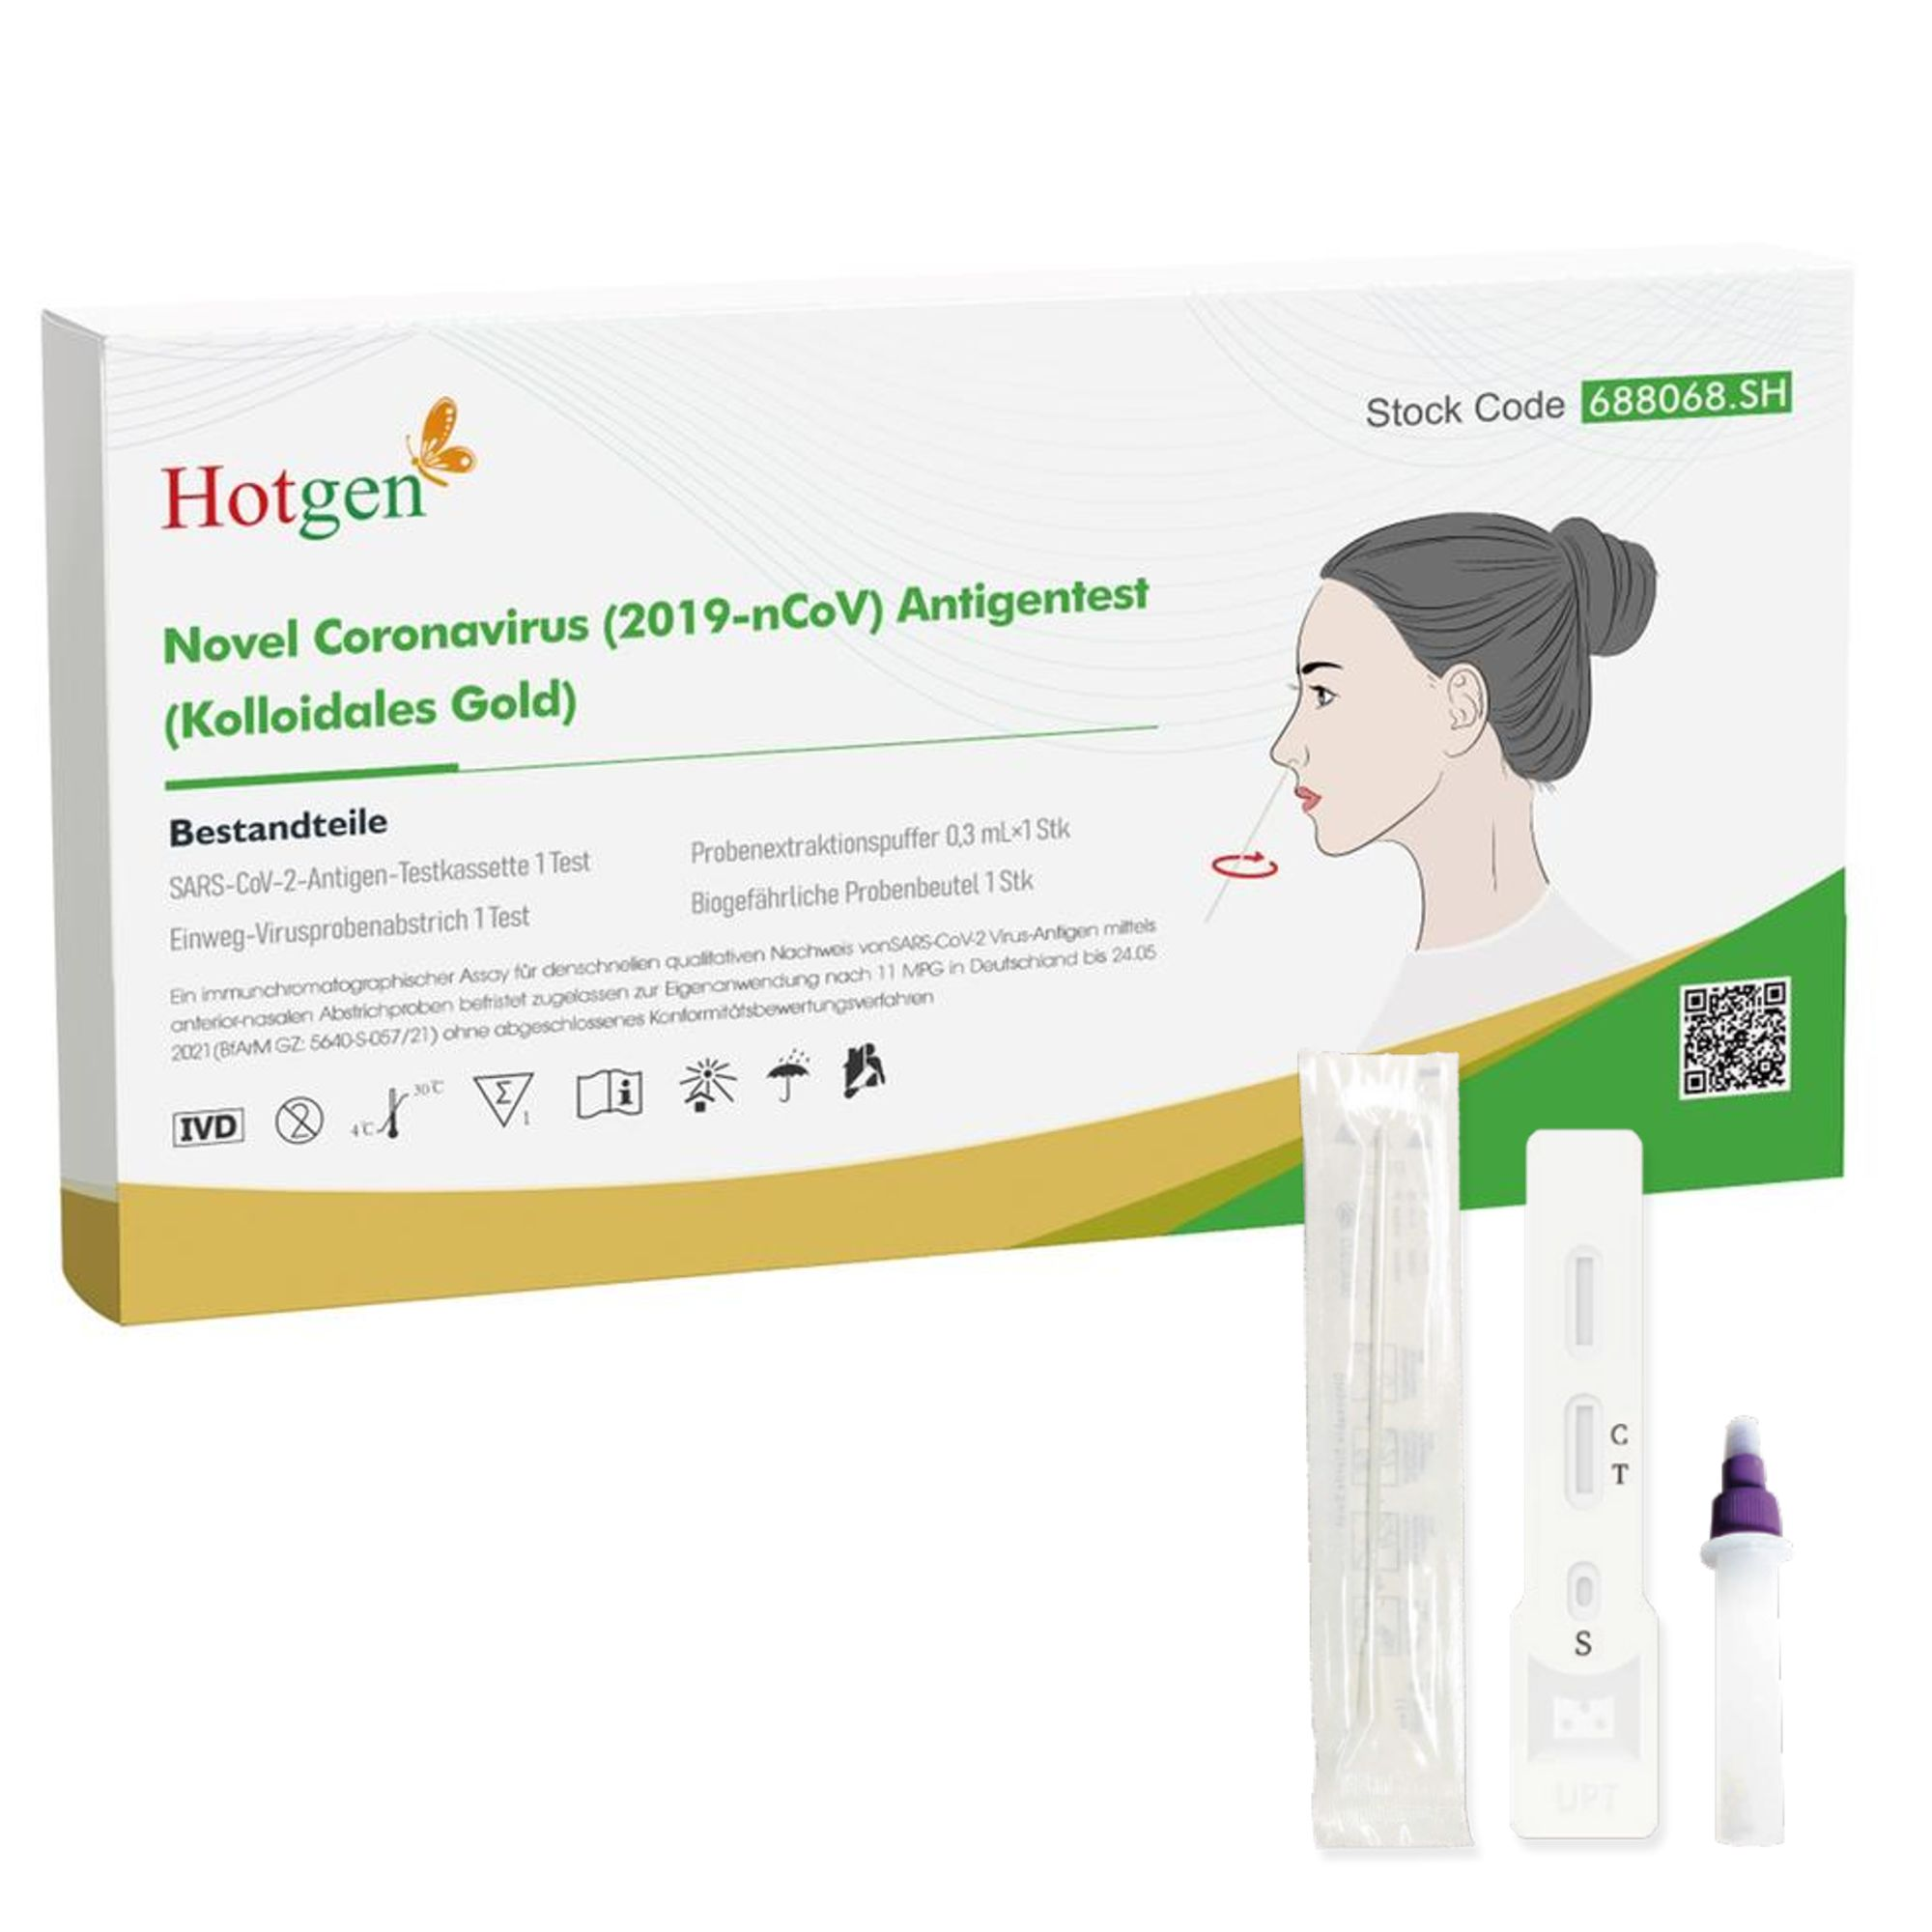 5er Packung Hotgen Novel Coronavirus (2019-nCoV)-Antigentest (Kolloidales Gold)(vorderer Nasenabstrich)